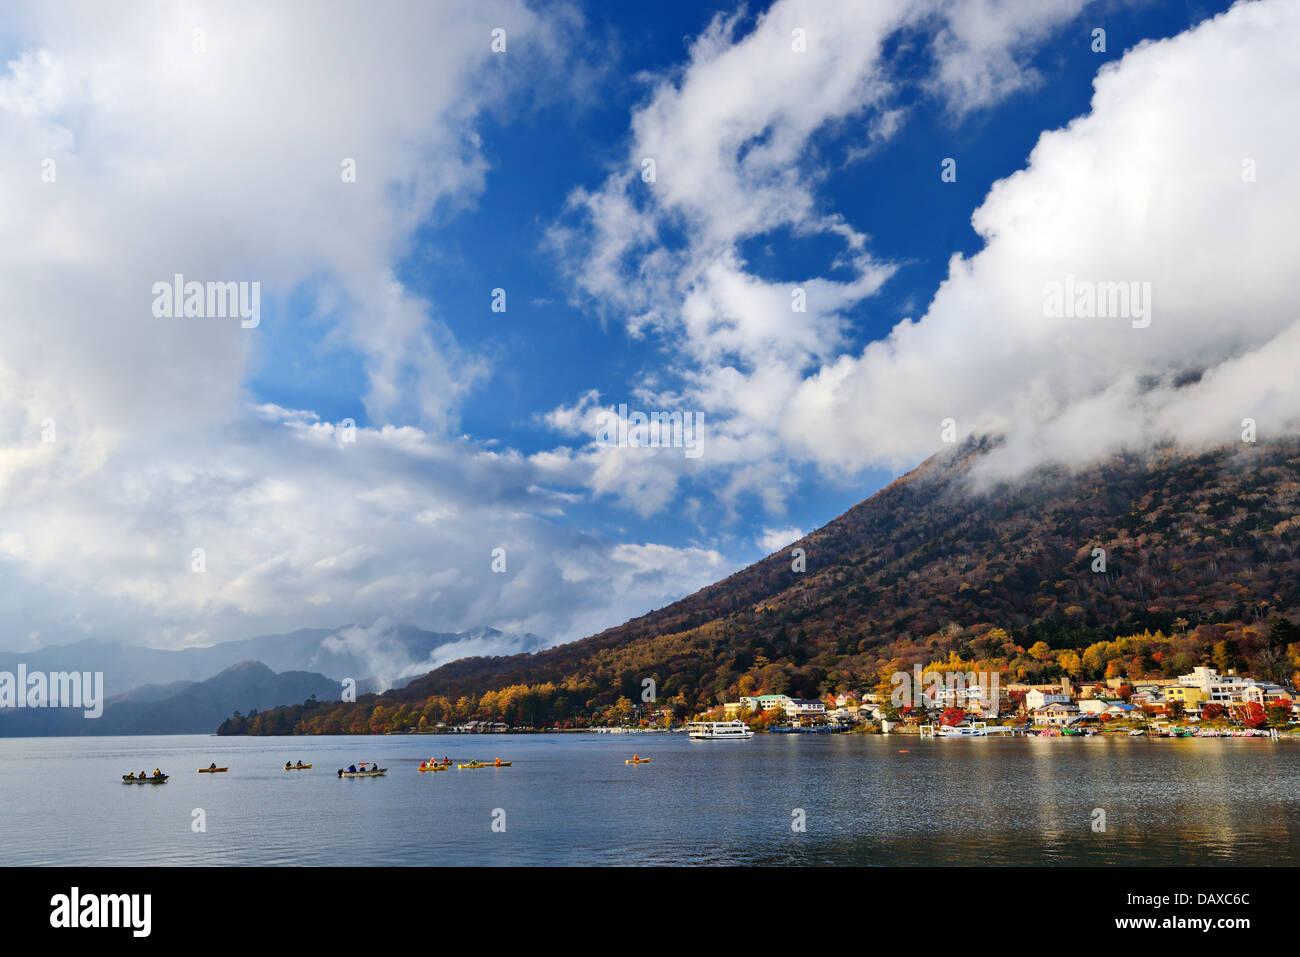 Mt. Nantai and Lake Chuzenji in Nikko, Japan. - Stock Image